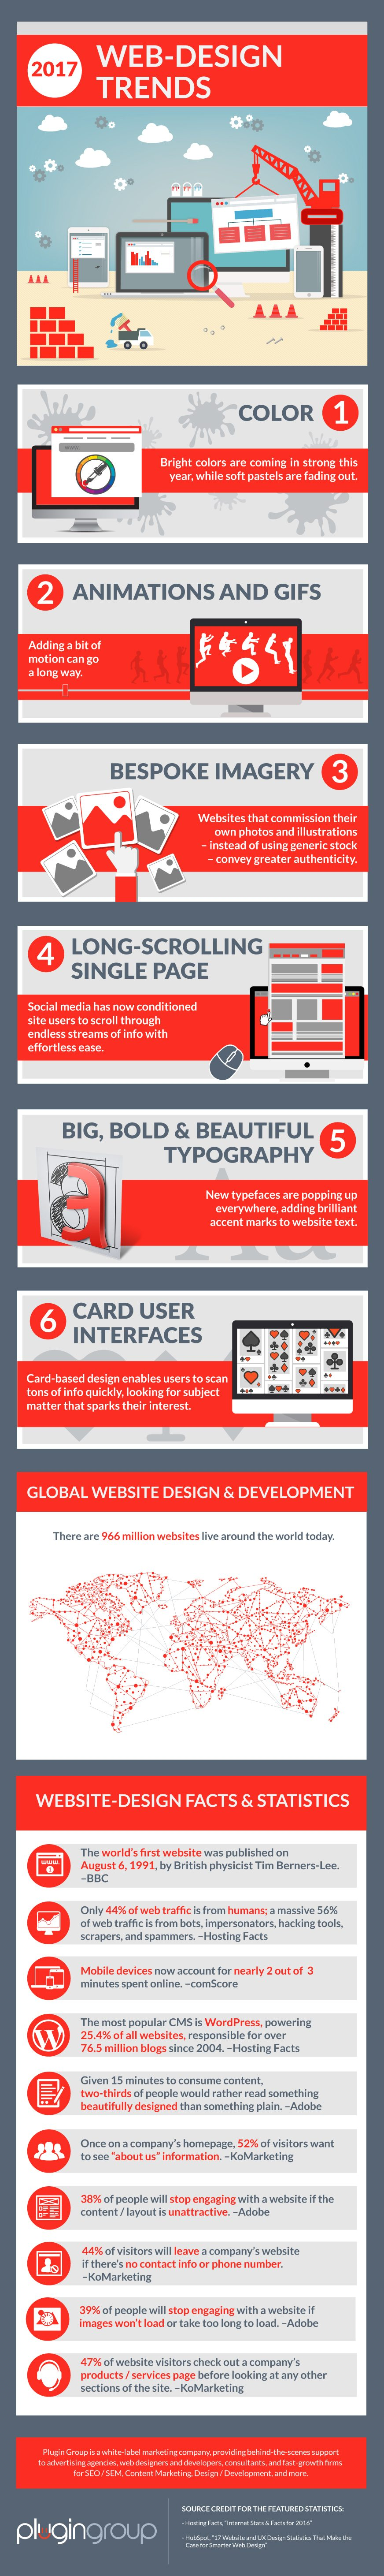 The best web design trends 2017